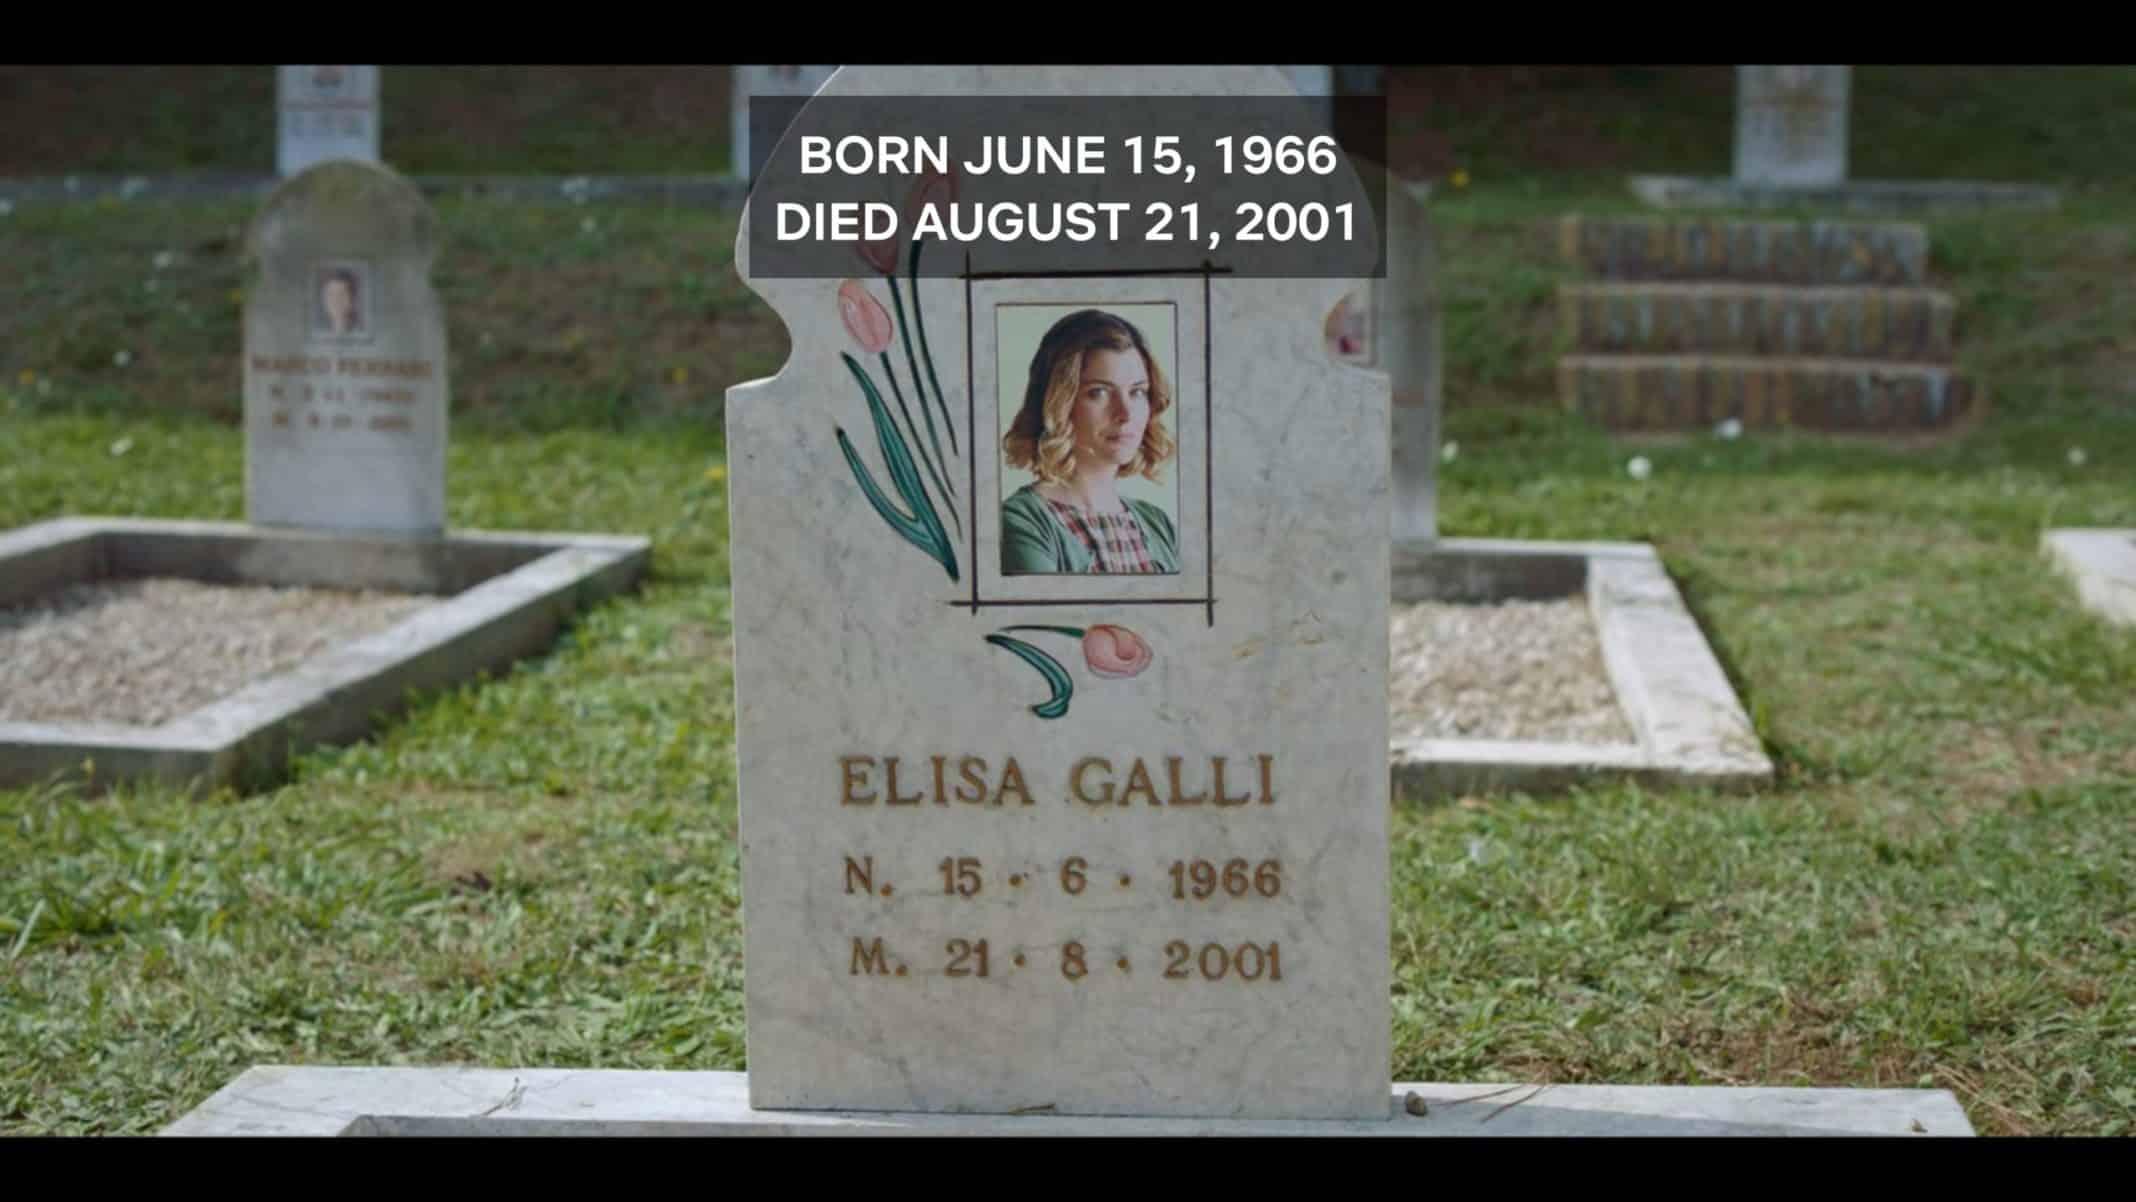 Elisa's headstone.